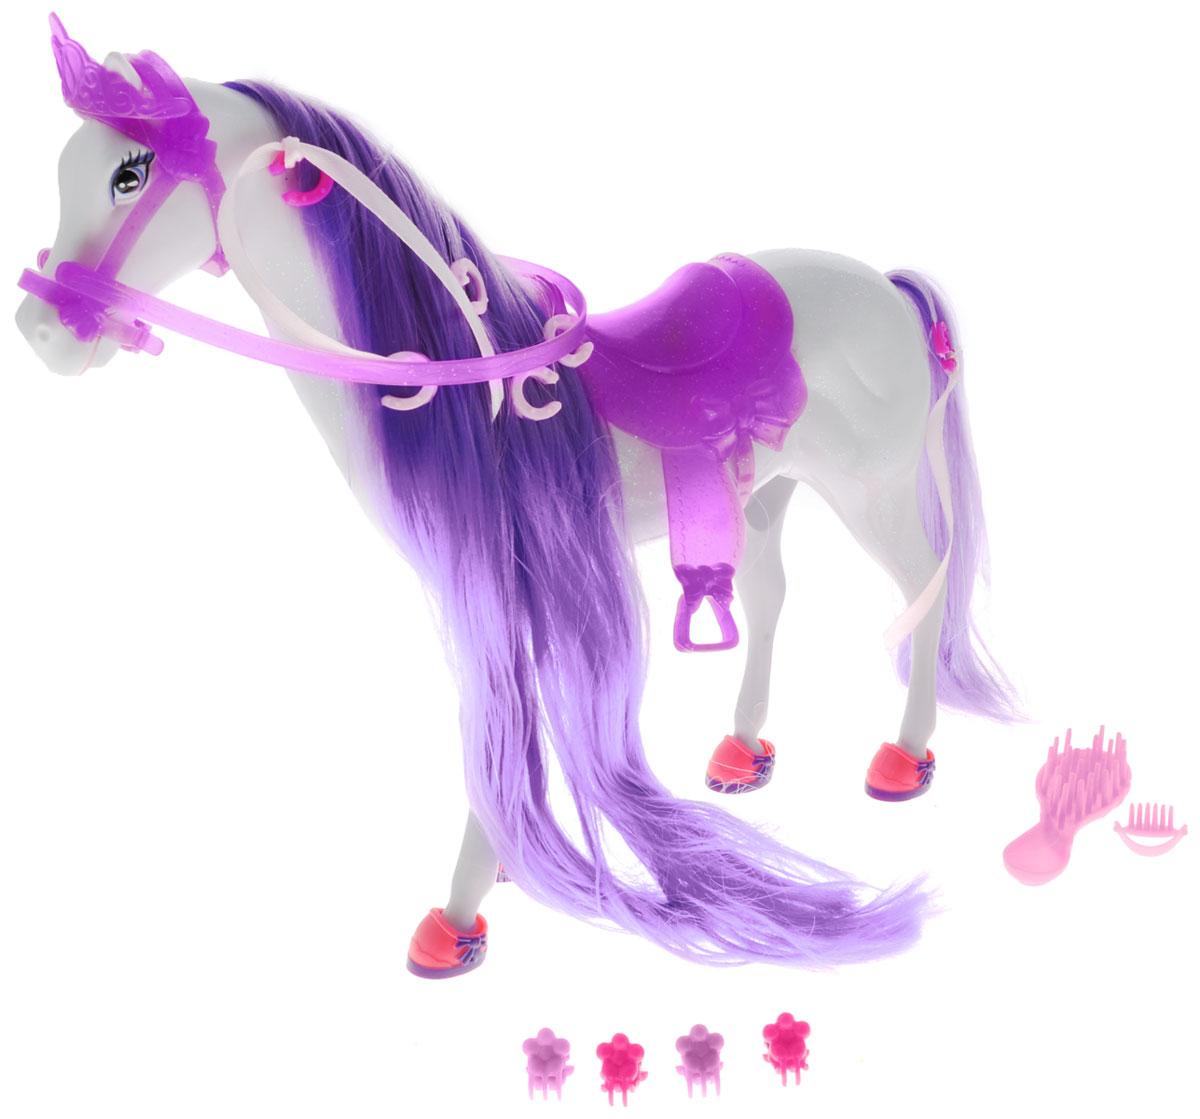 Simba Транспорт для кукол Лошадь для Штеффи цвет сиреневый simba игровой набор с куклой штеффи water styles fashion